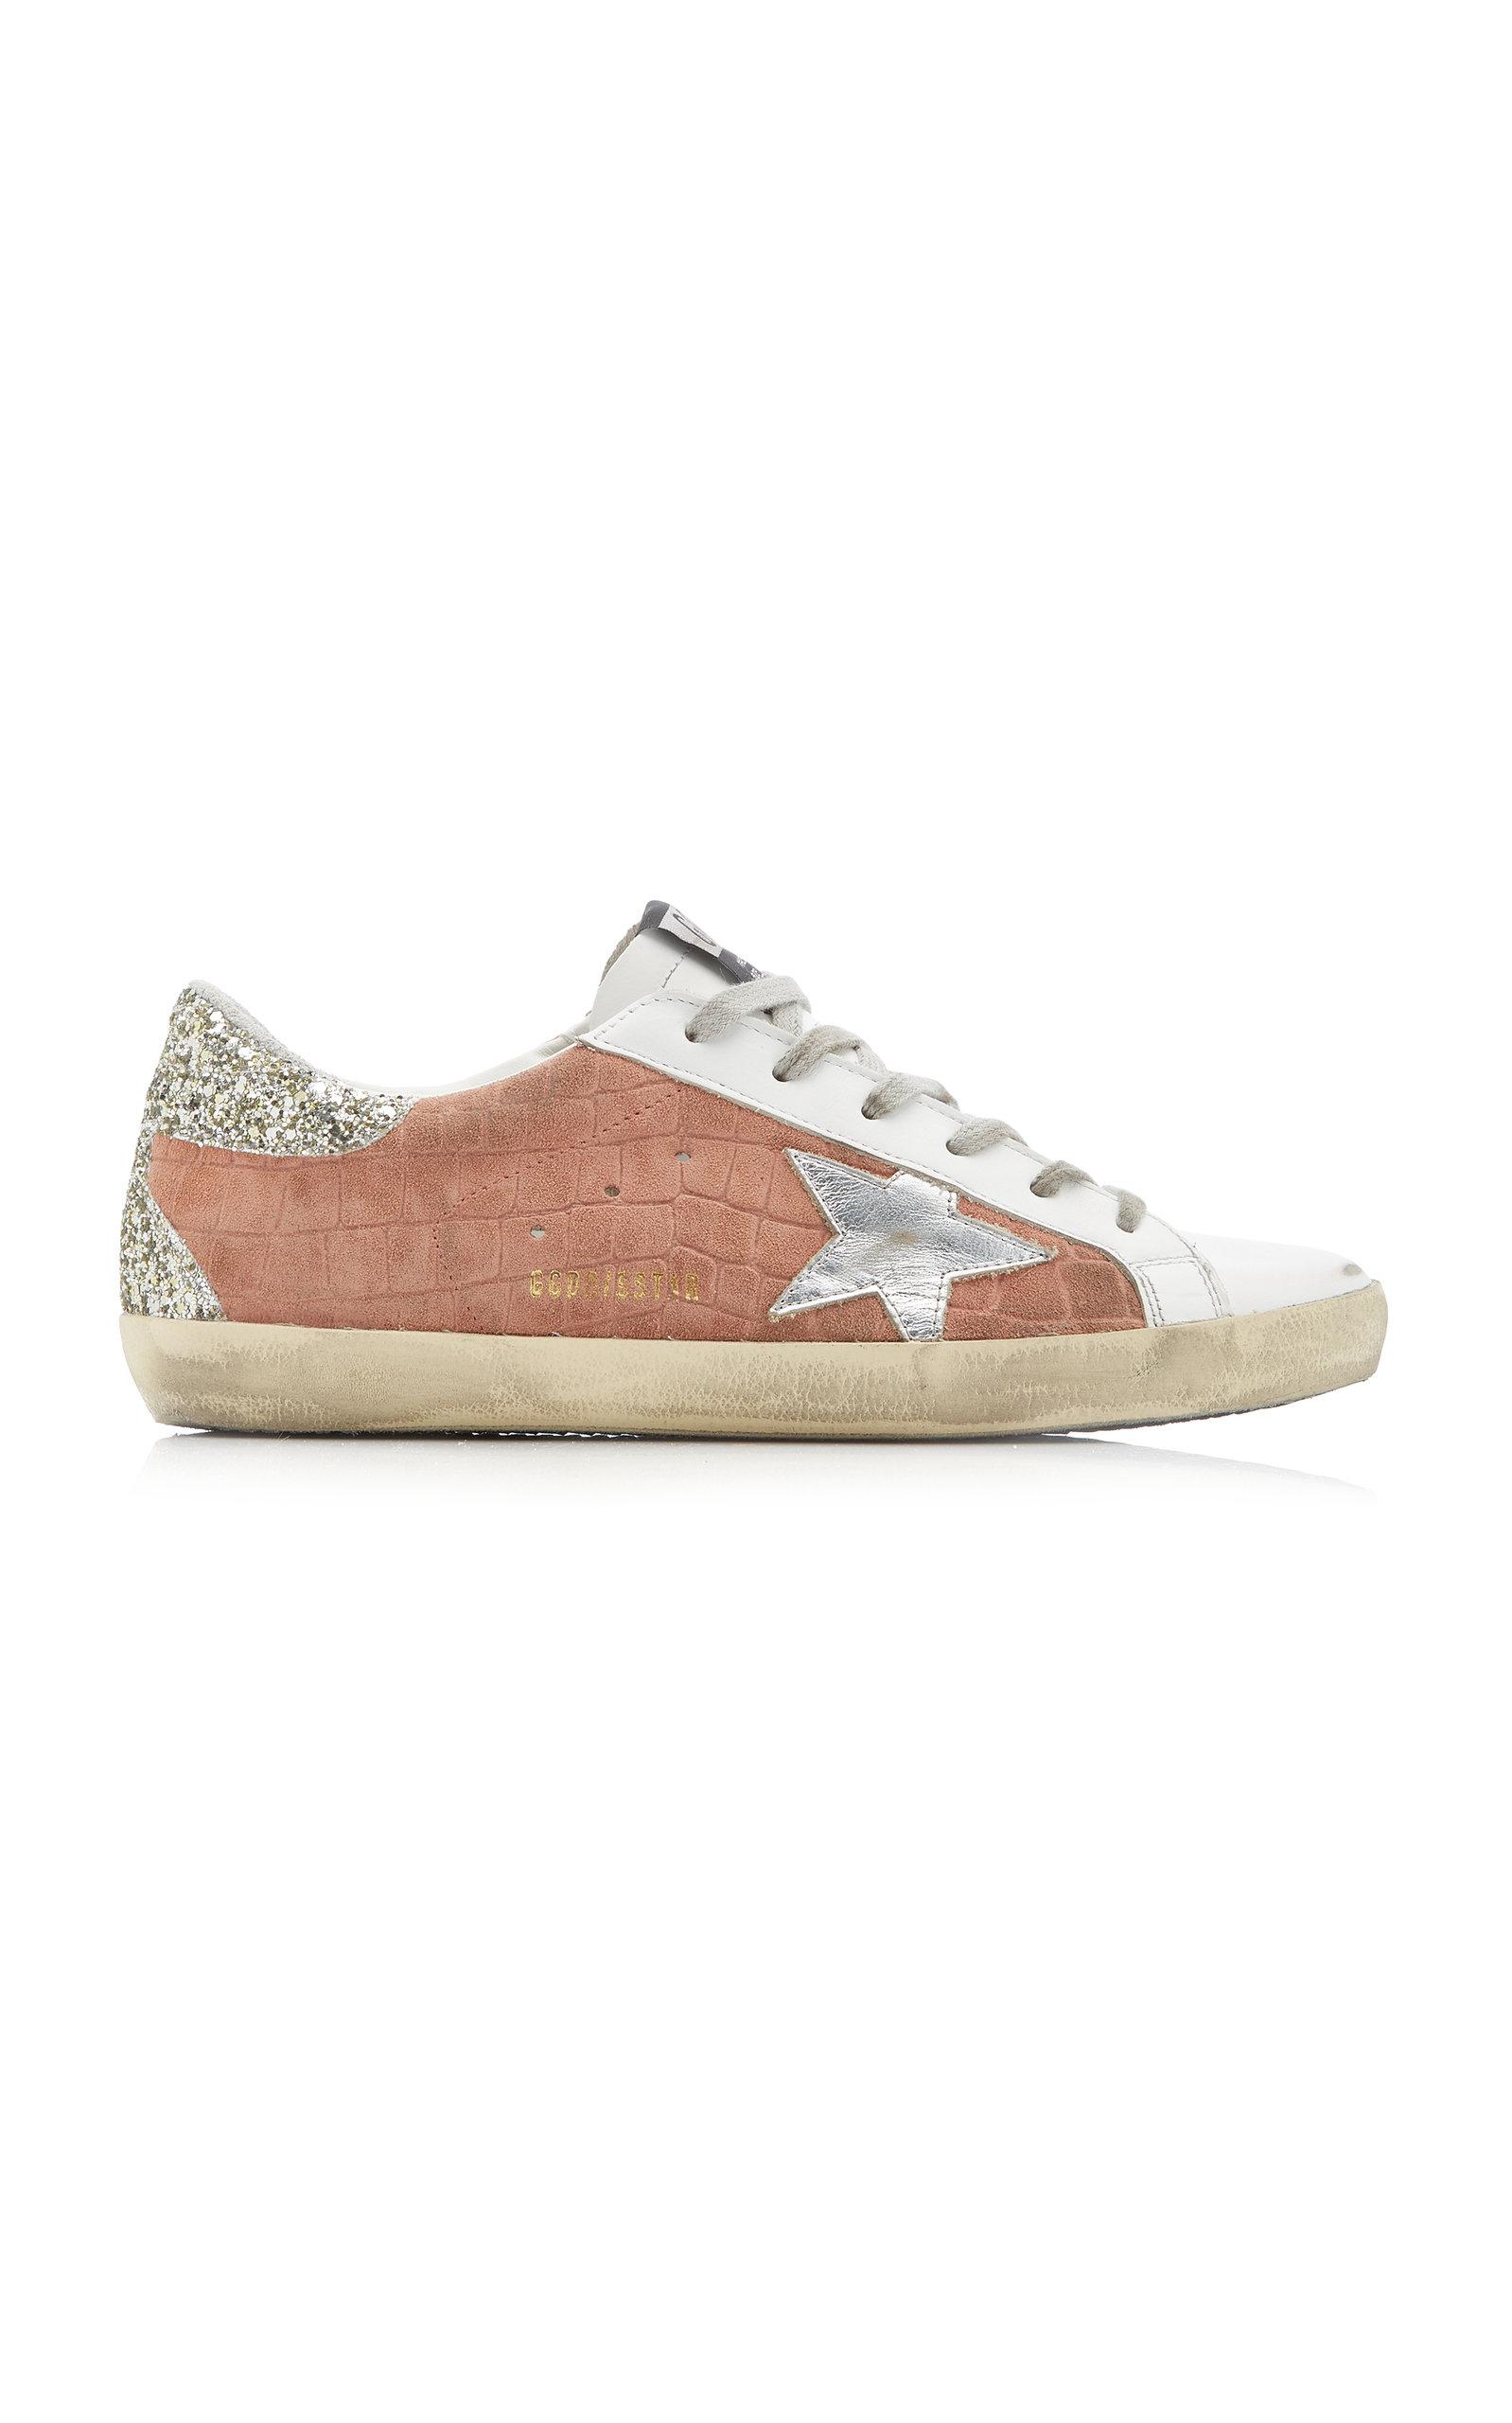 Golden Goose - Women's Superstar Cocco Glittered Leather Sneakers - Pink - Moda Operandi